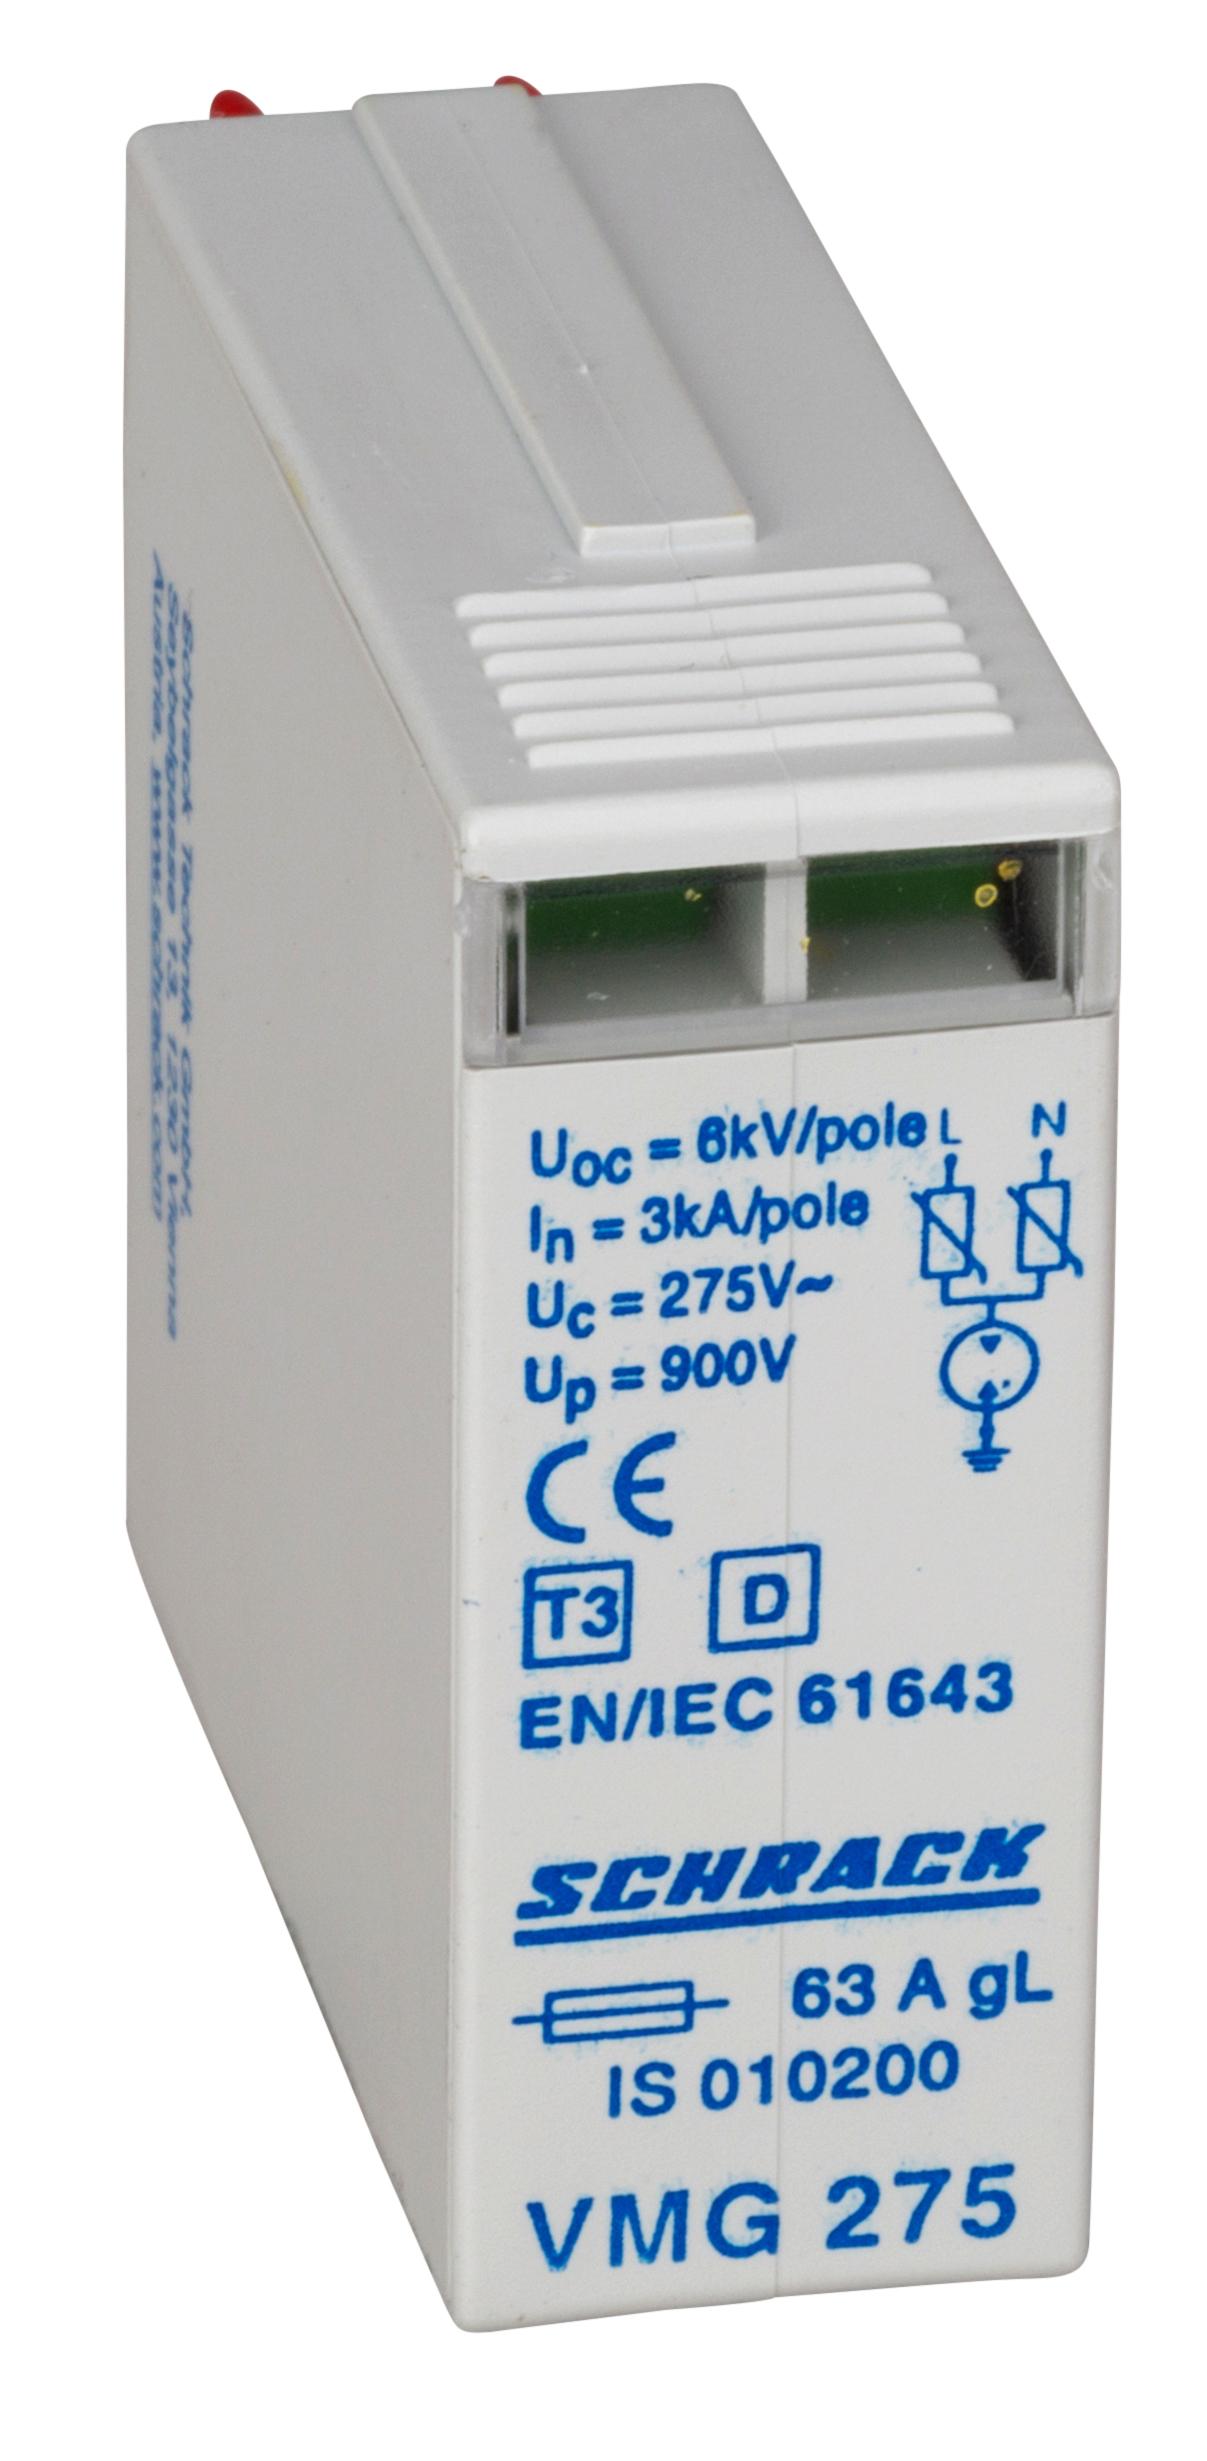 1 Stk D/T3-Ableiter Modul 3kA, VMG 275V, 1 Teilungseinheit IS010200--